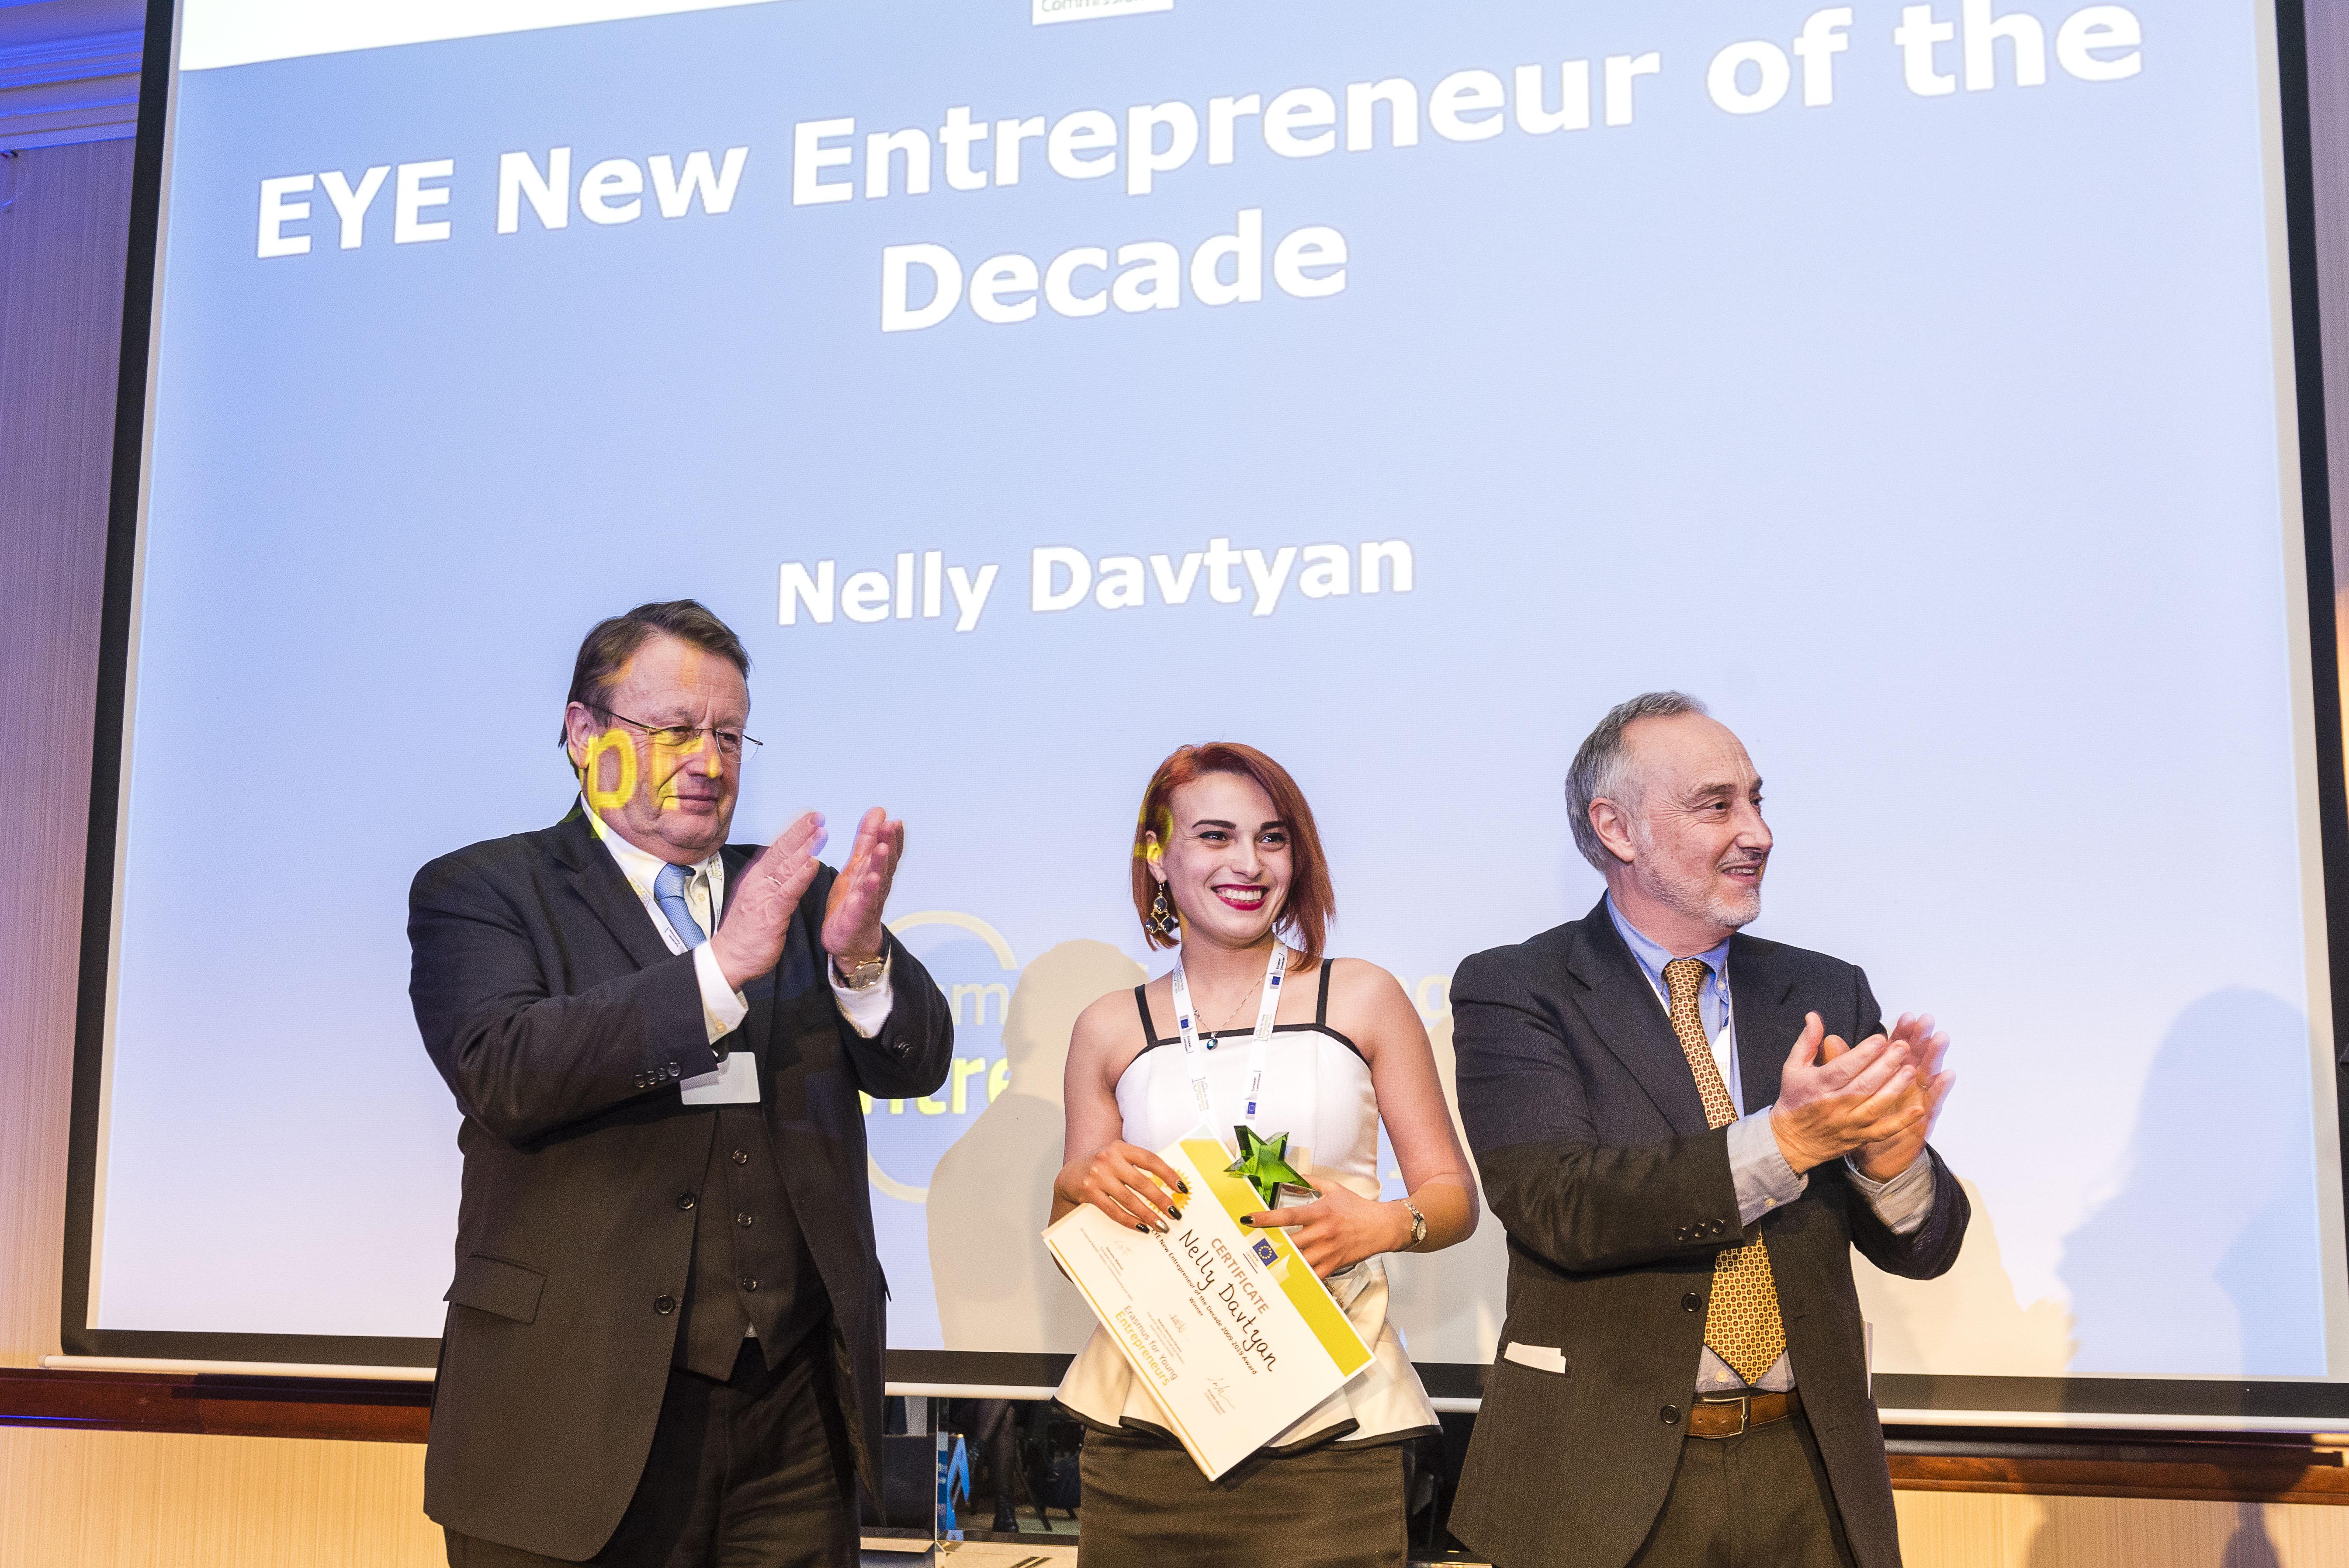 (Armenia) was awarded as EYE Host Entrepreneur of the Decade category․ Armenian Նելլի Դավթյանը (Հայաստան) «EYE Host Entrepreneur of the Decade» անվանակարգի մրցանակակիր